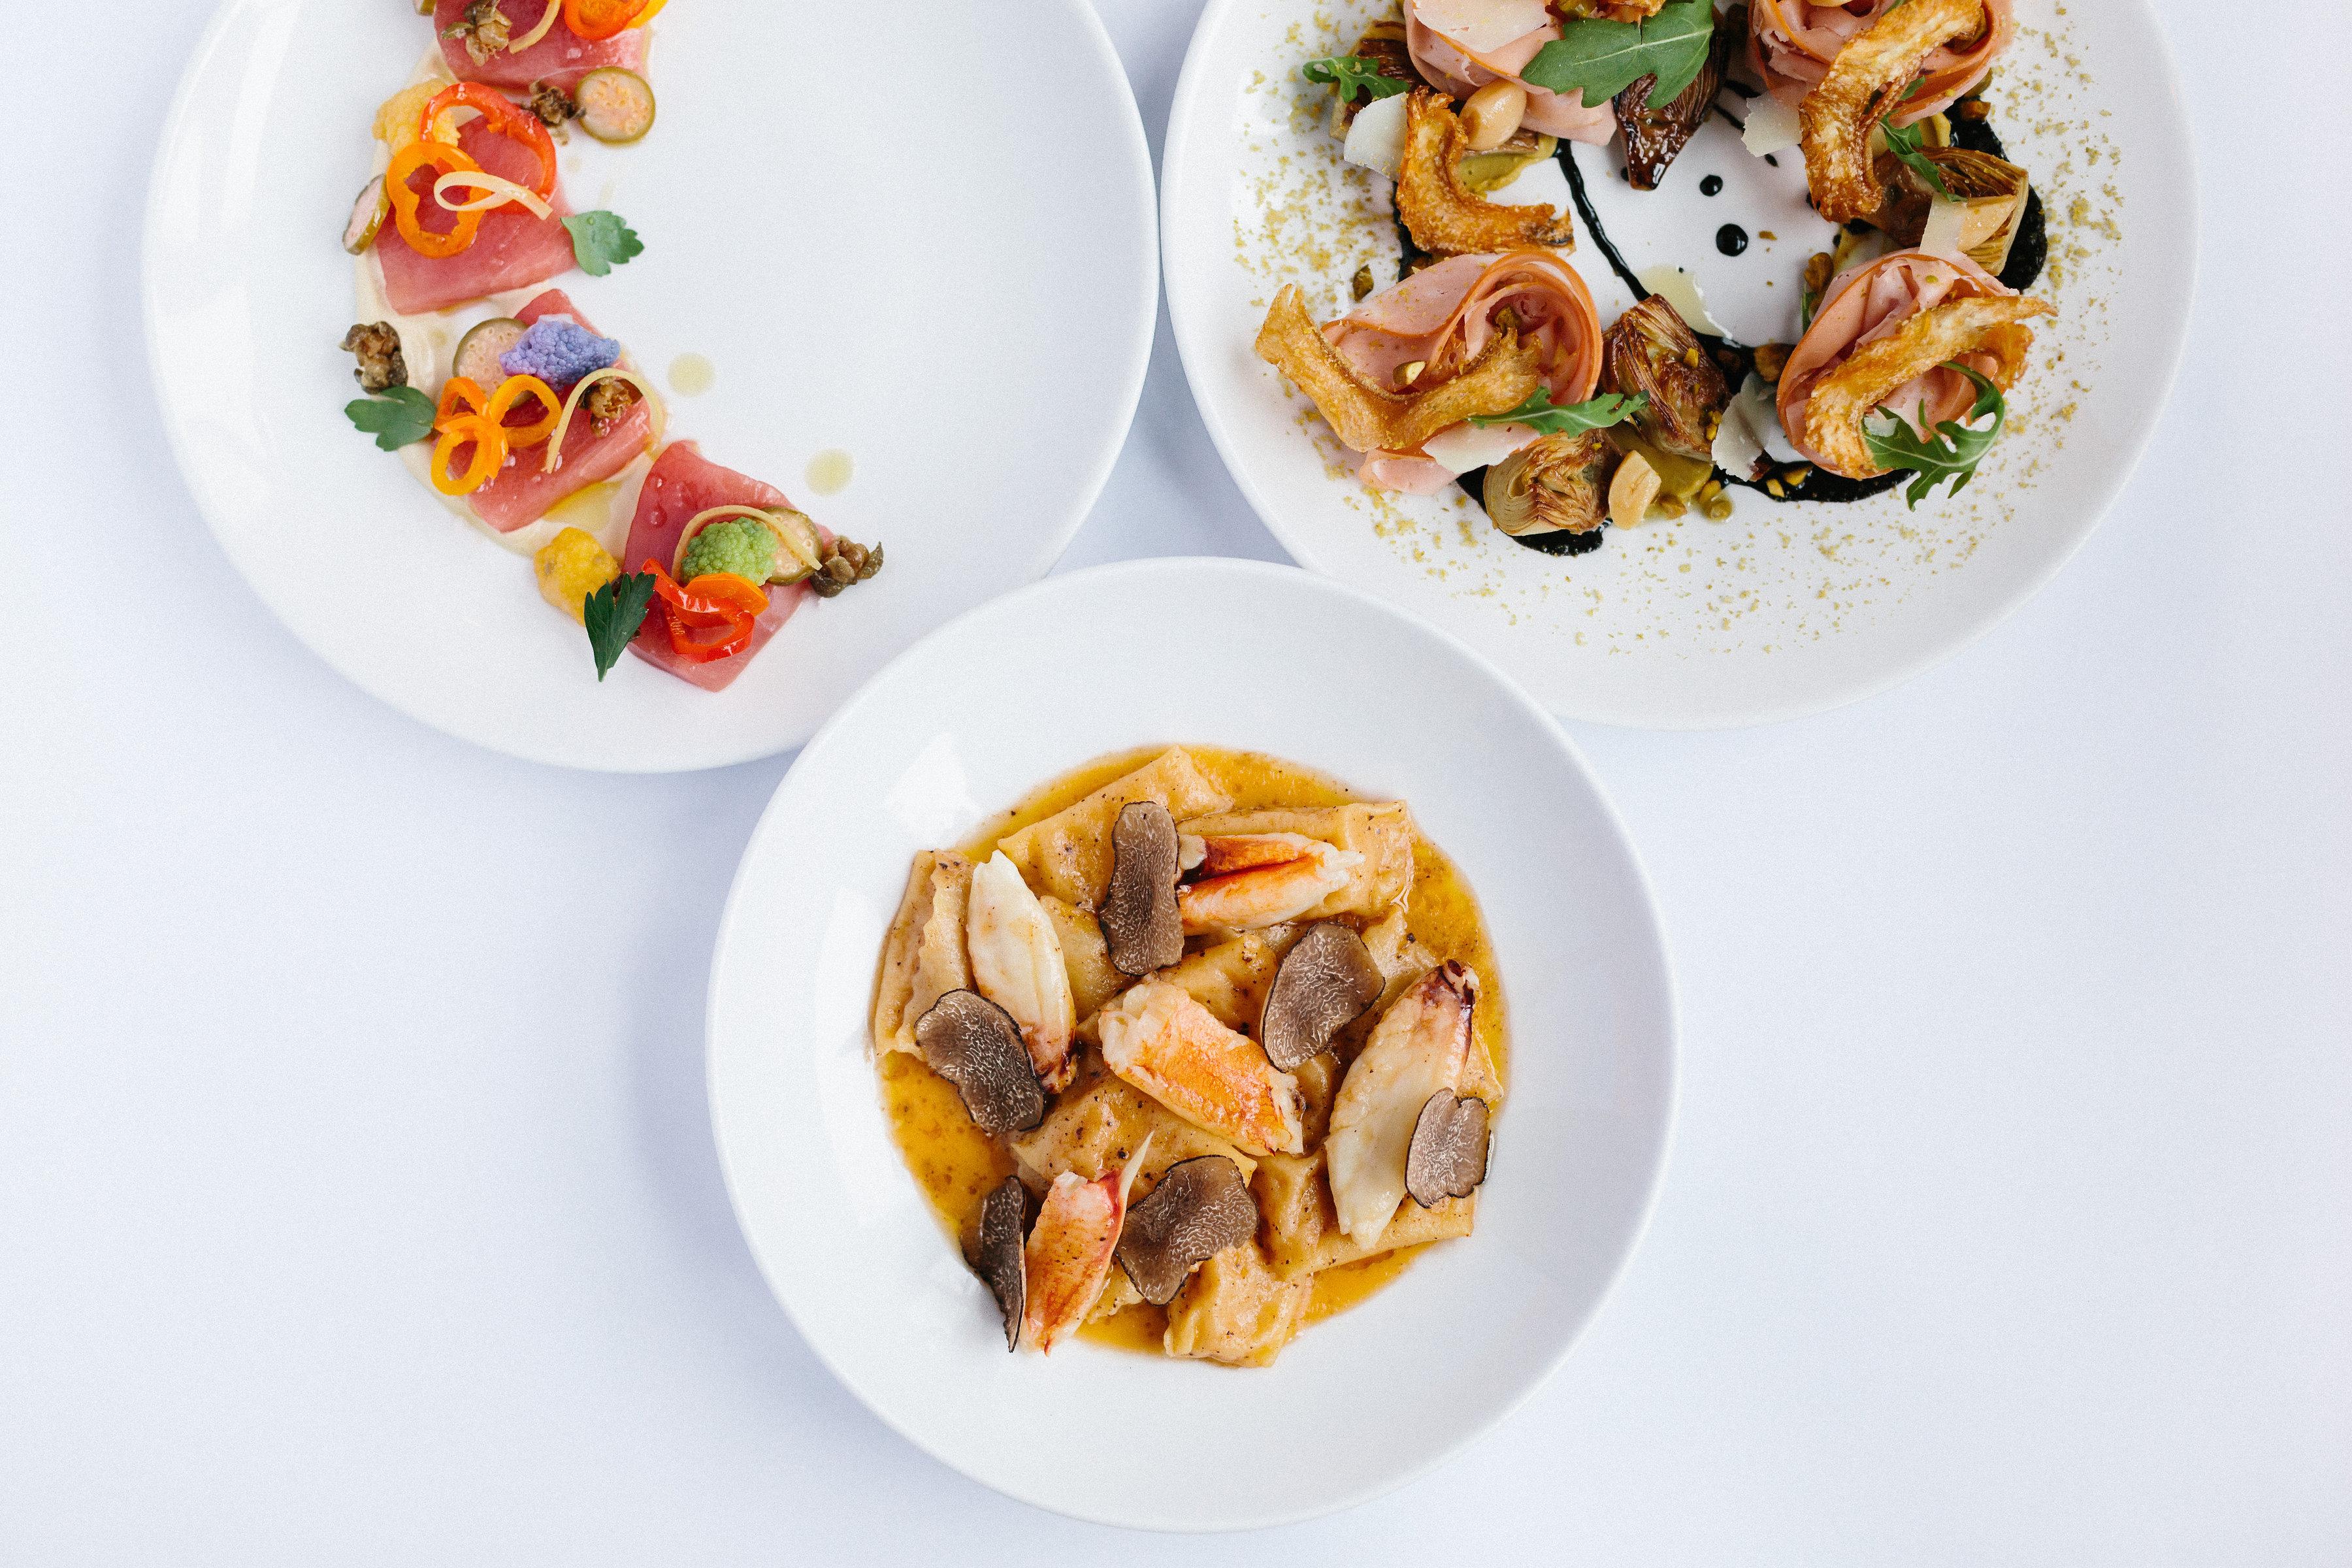 Cuisine constantly evolves at San Francisco\'s Mina Test Kitchen ...